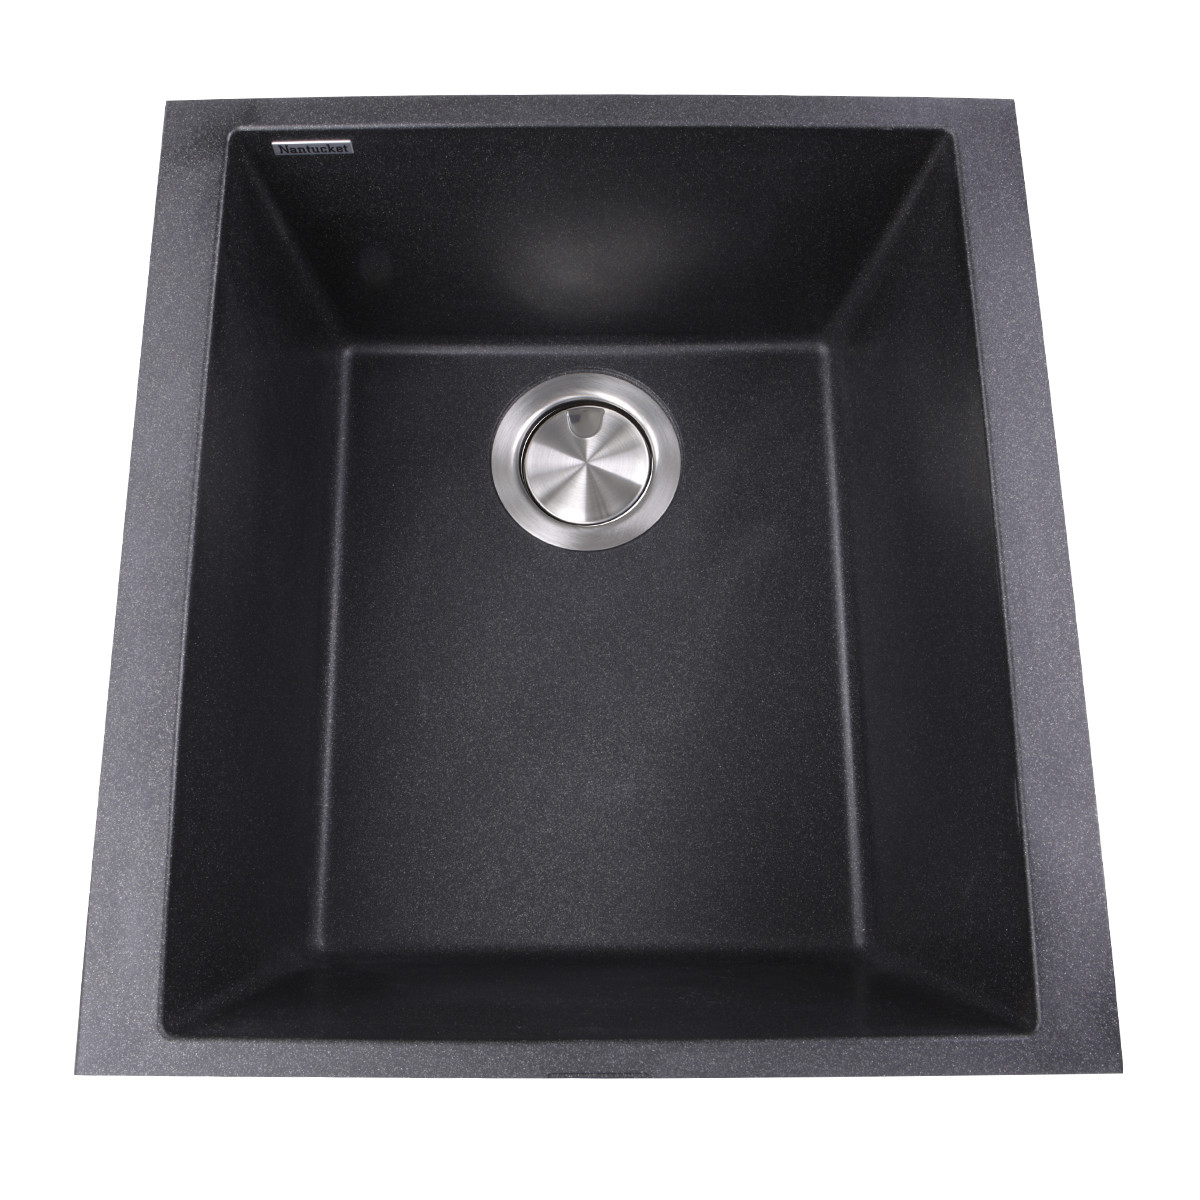 Nantucket Sinks PR1716-BL Single Bowl Undermount Granite Composite Bar-Prep Sink In Black